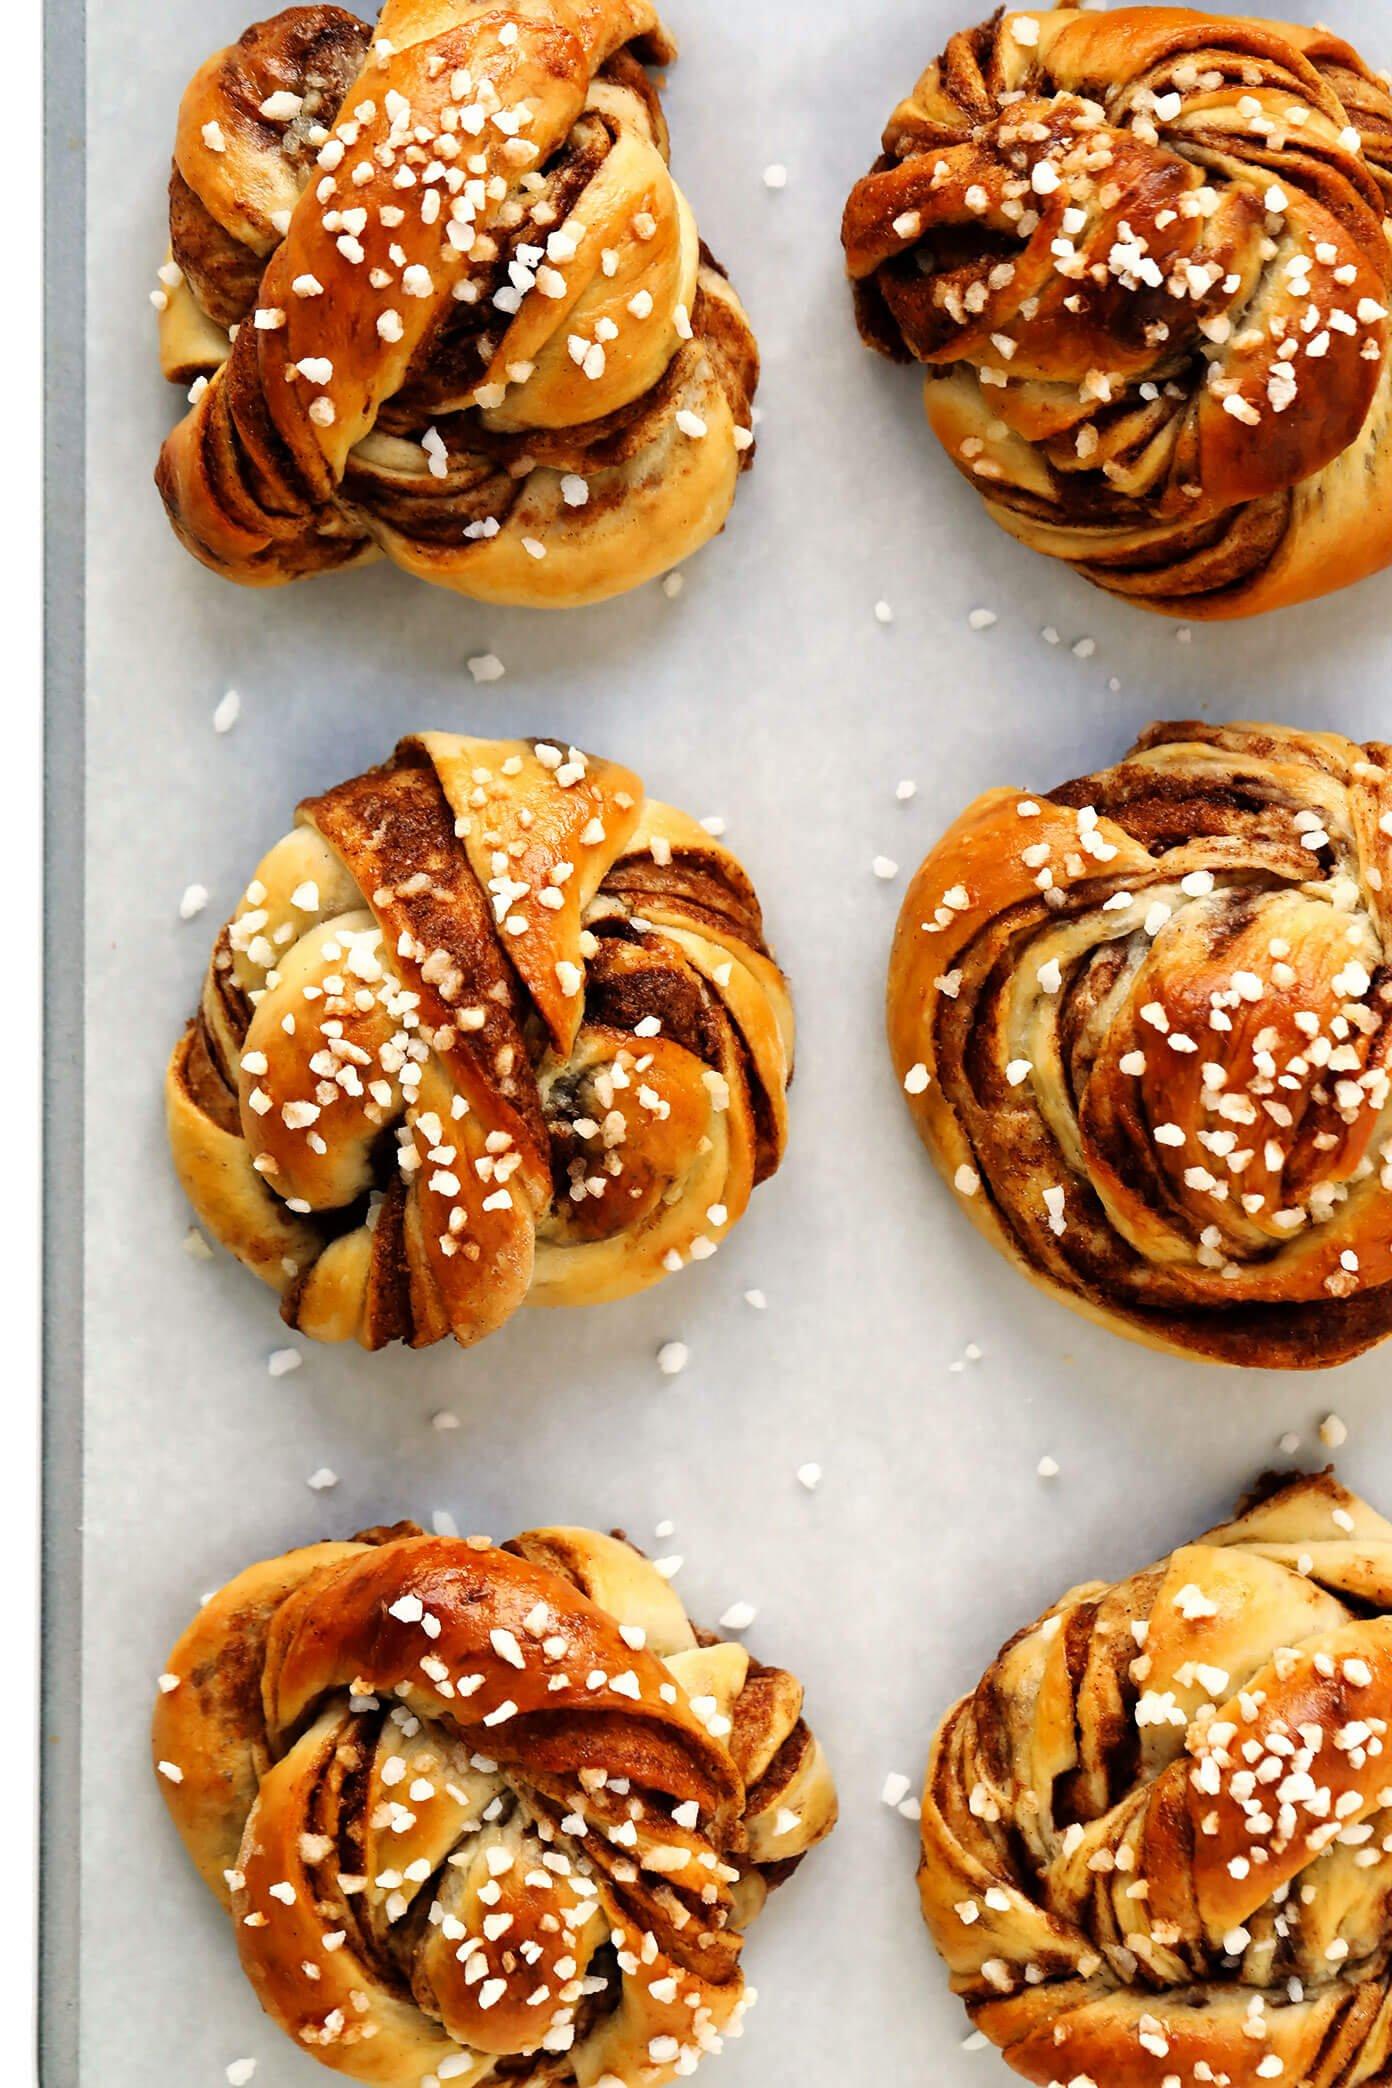 Swedish Cinnamon Roll Recipe (with Pearl Sugar)